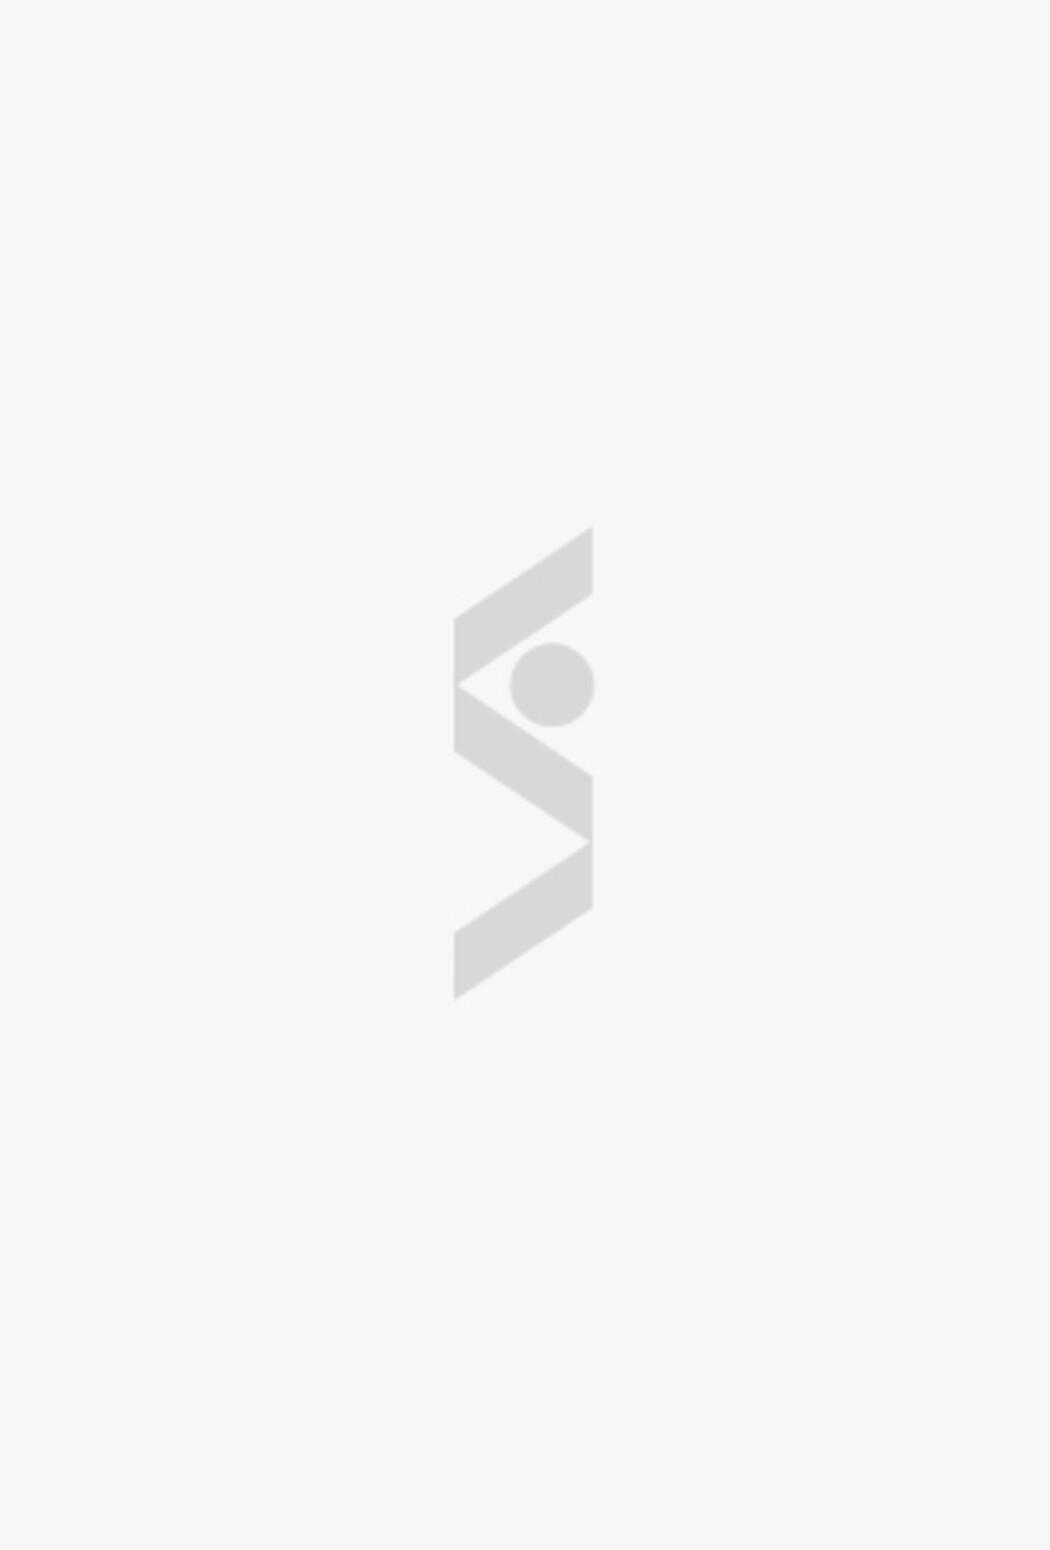 Набор для макияжа губ №3 Shiseido - скоро в продаже в интернет-магазине СТОКМАНН в Москве BAFC85AF-910D-4DEB-A33F-6FEB126D97E3